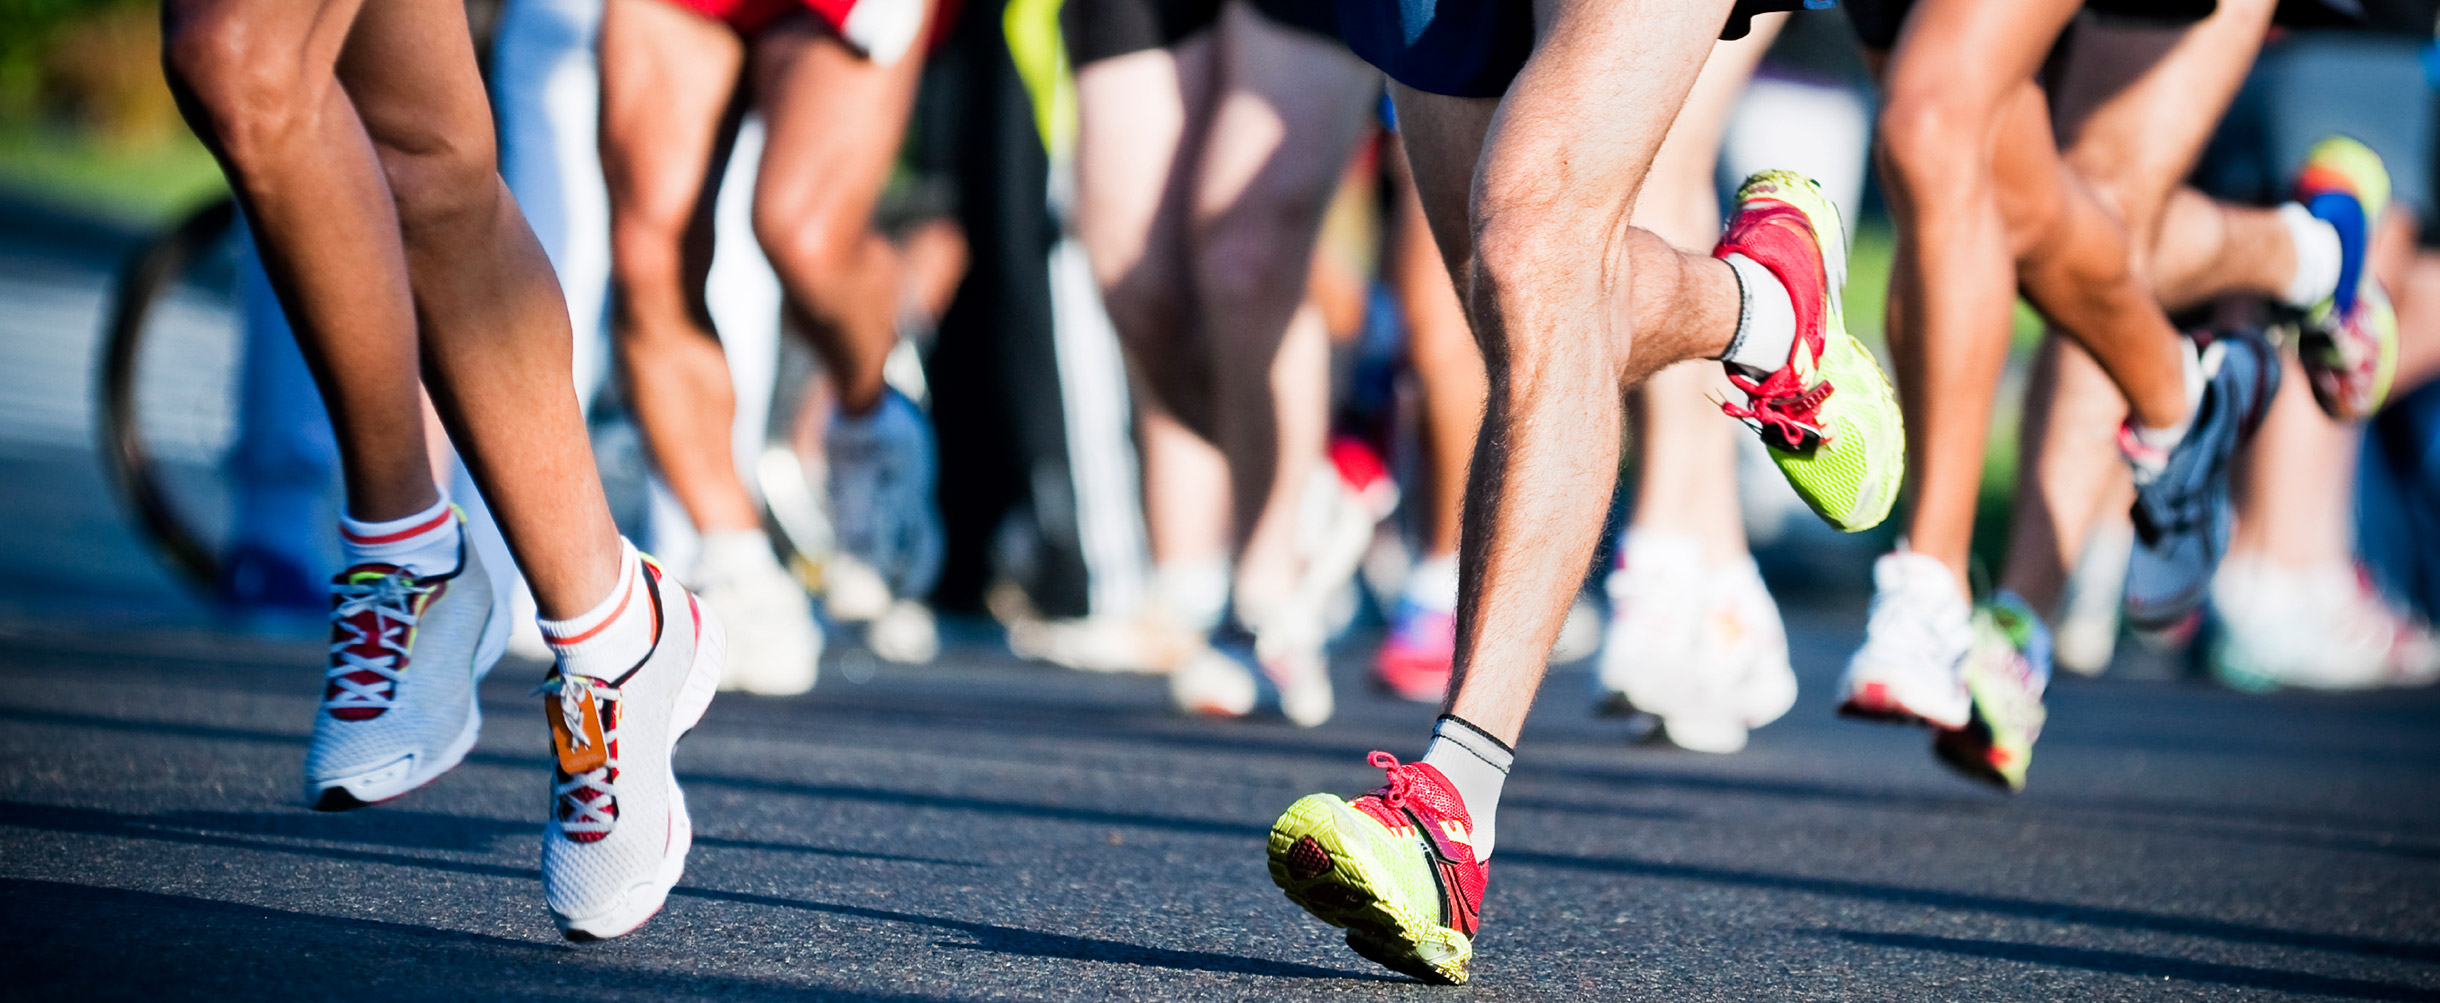 marathon_centrokinesis